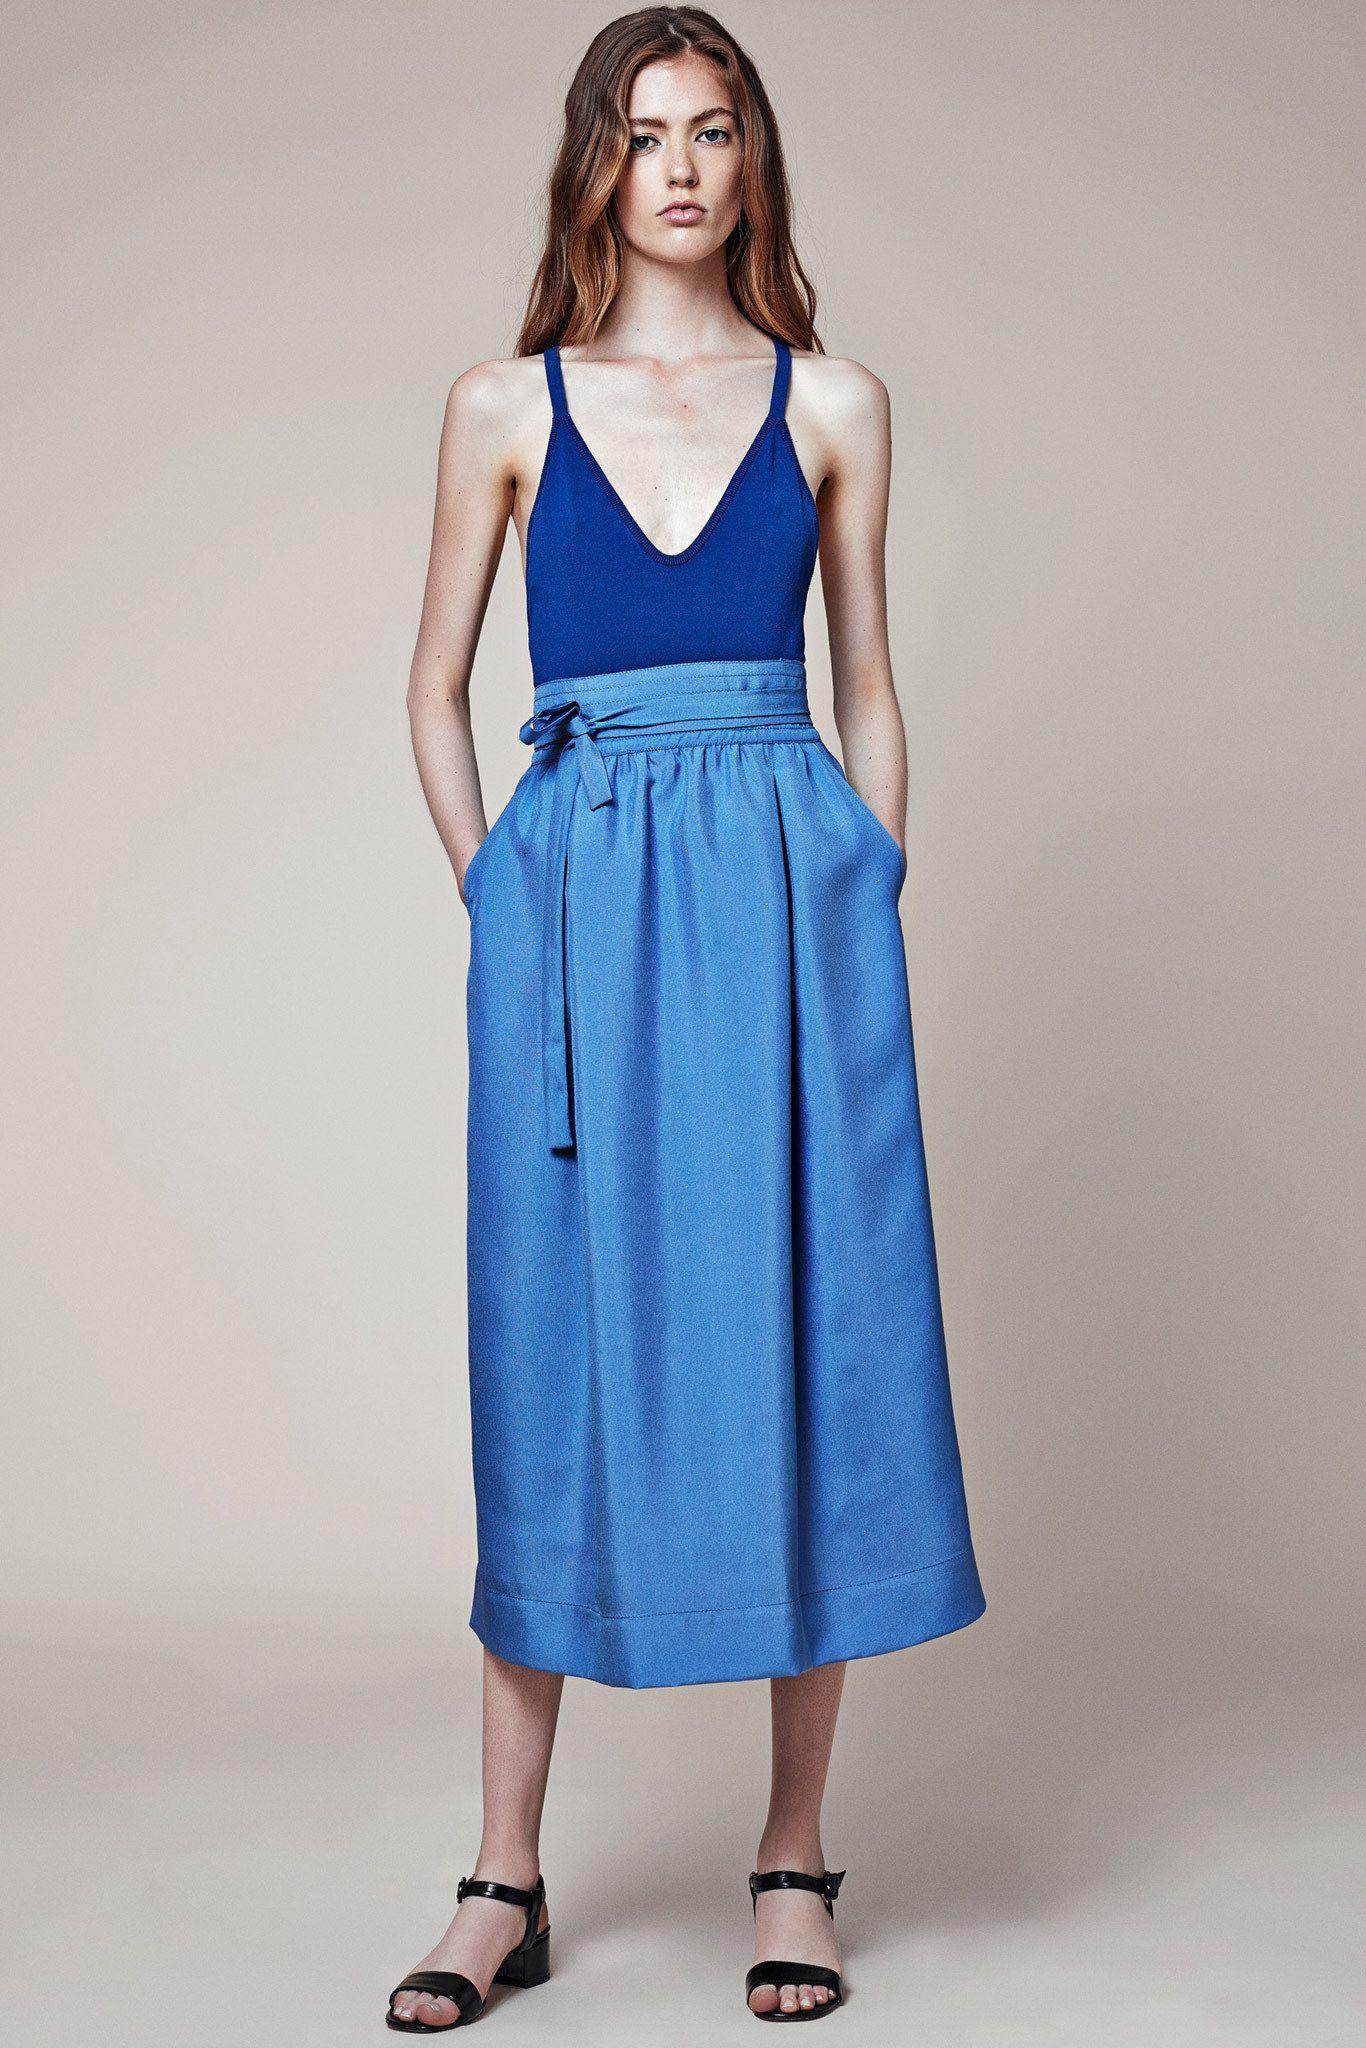 Jill Stuart Resort 2015 Fashion Show Fashion, Style